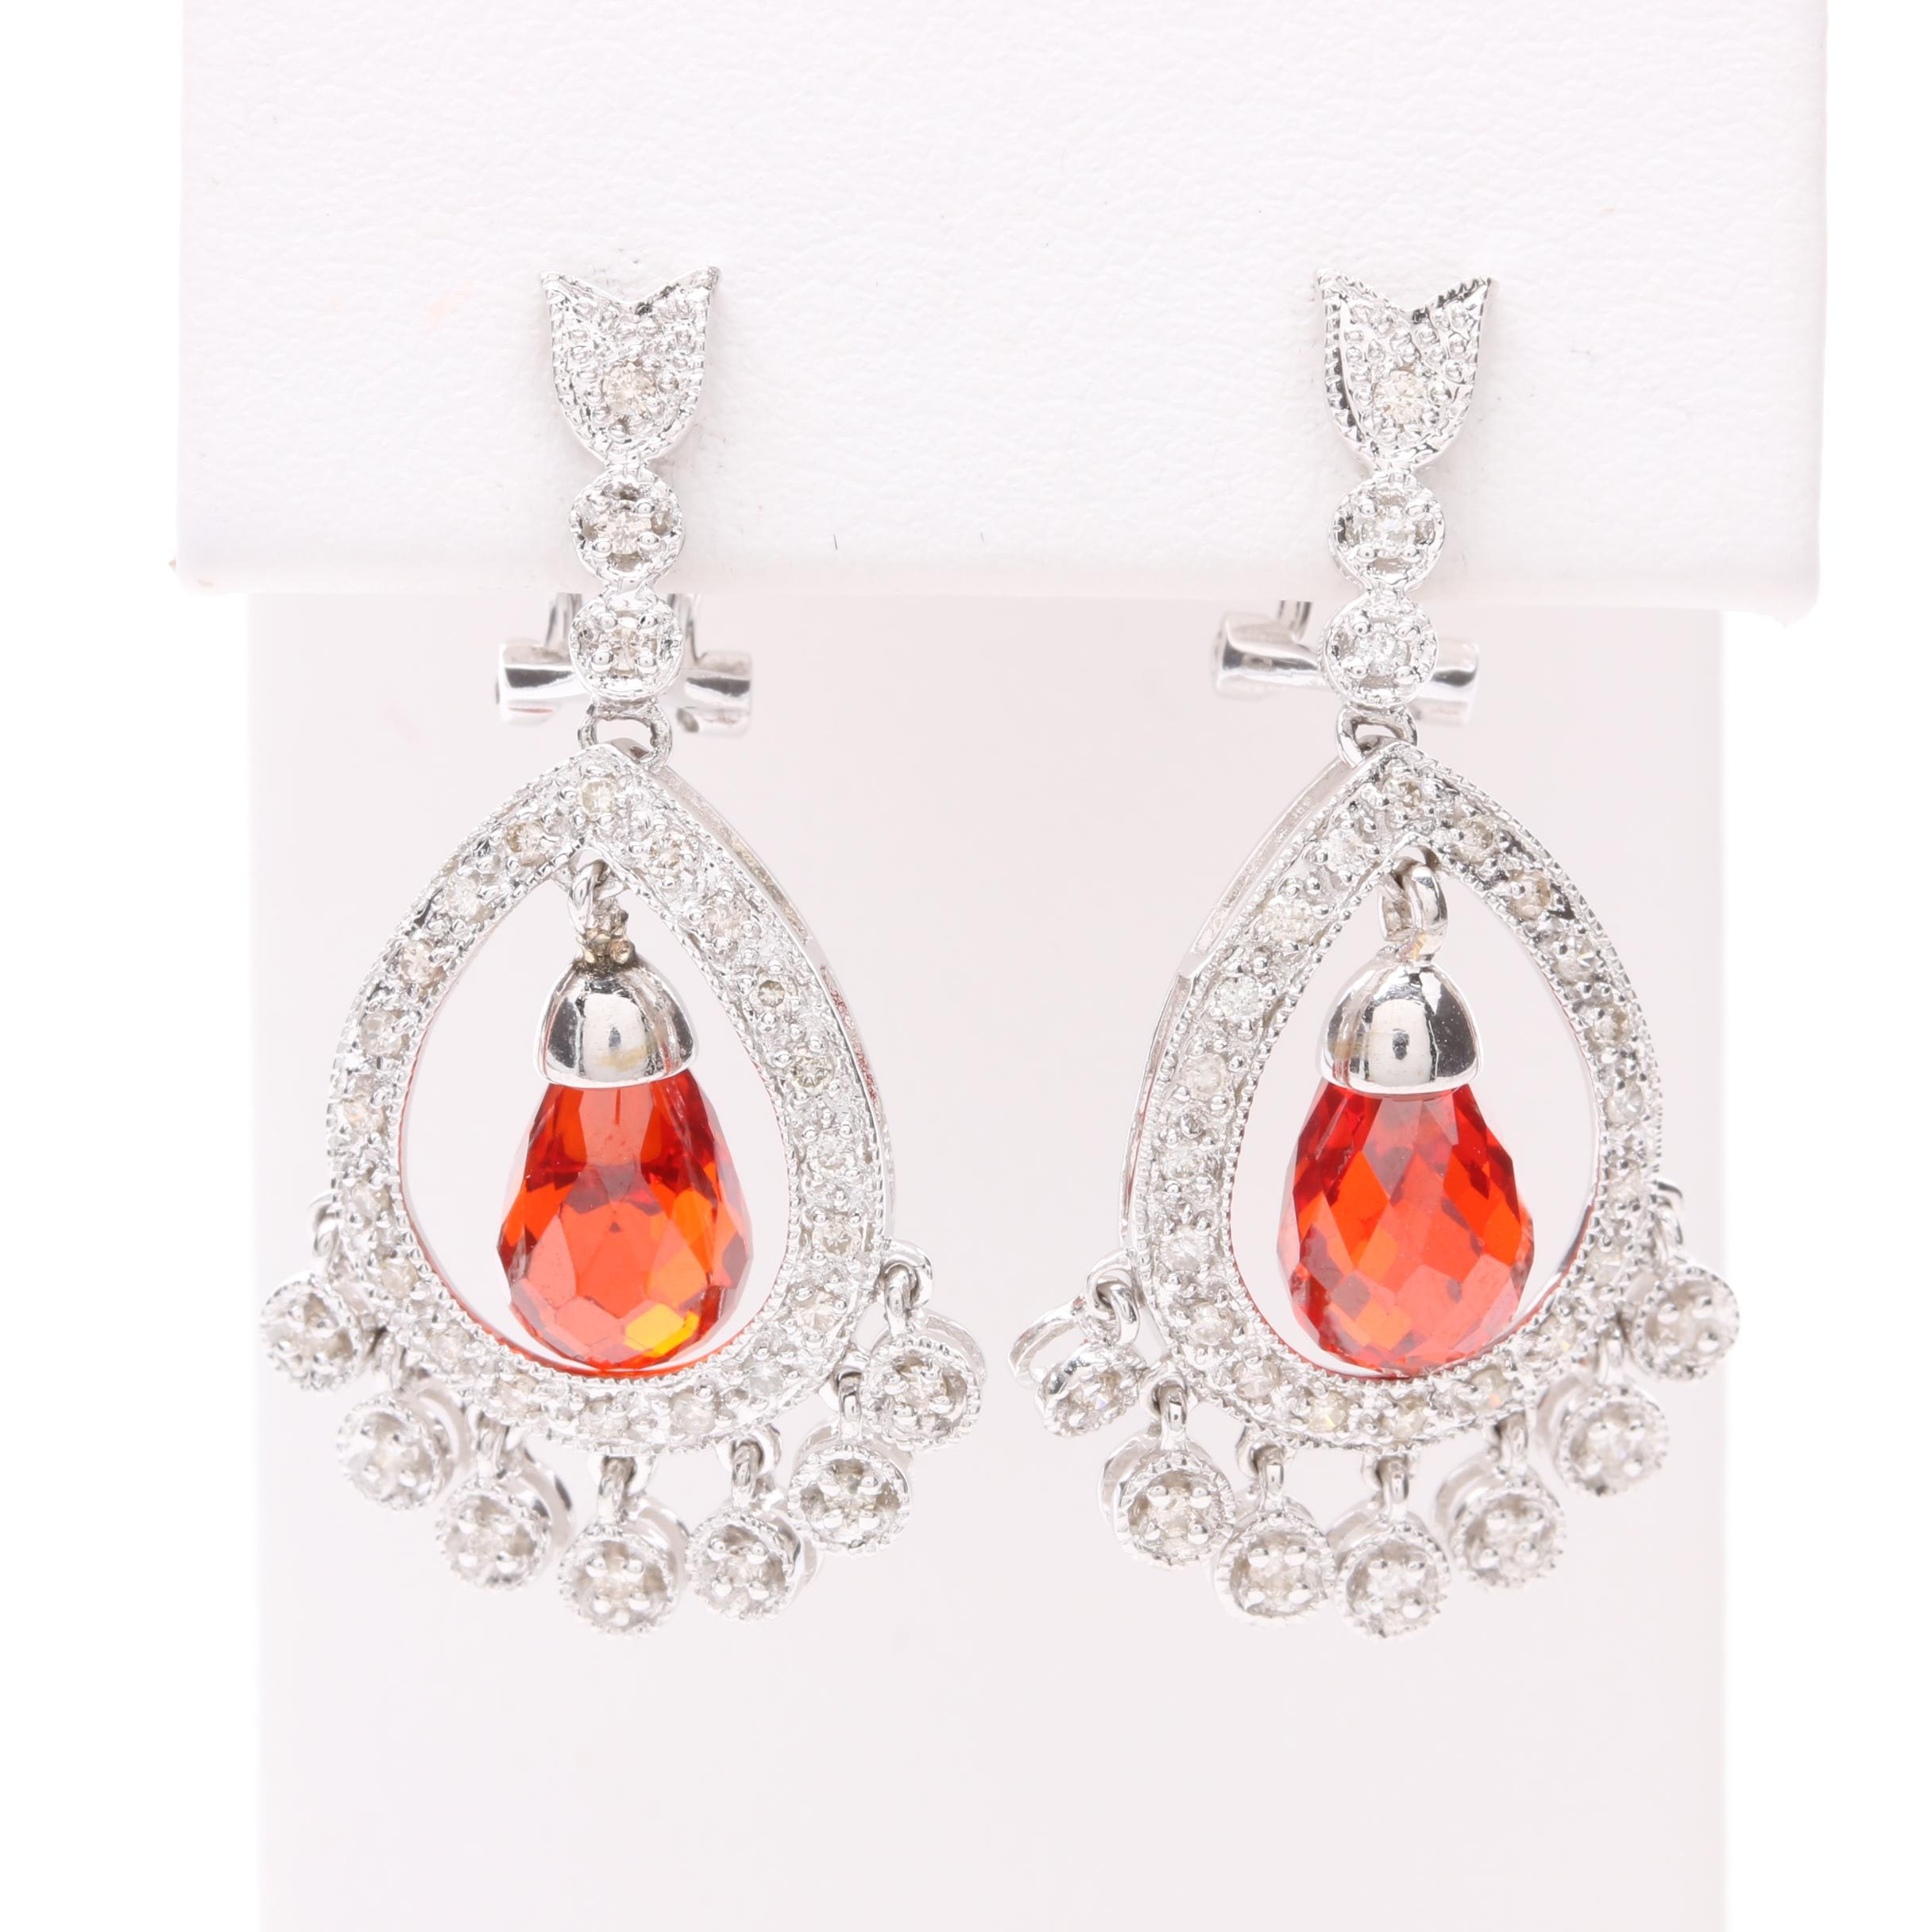 14K White Gold Glass and Diamond Earrings